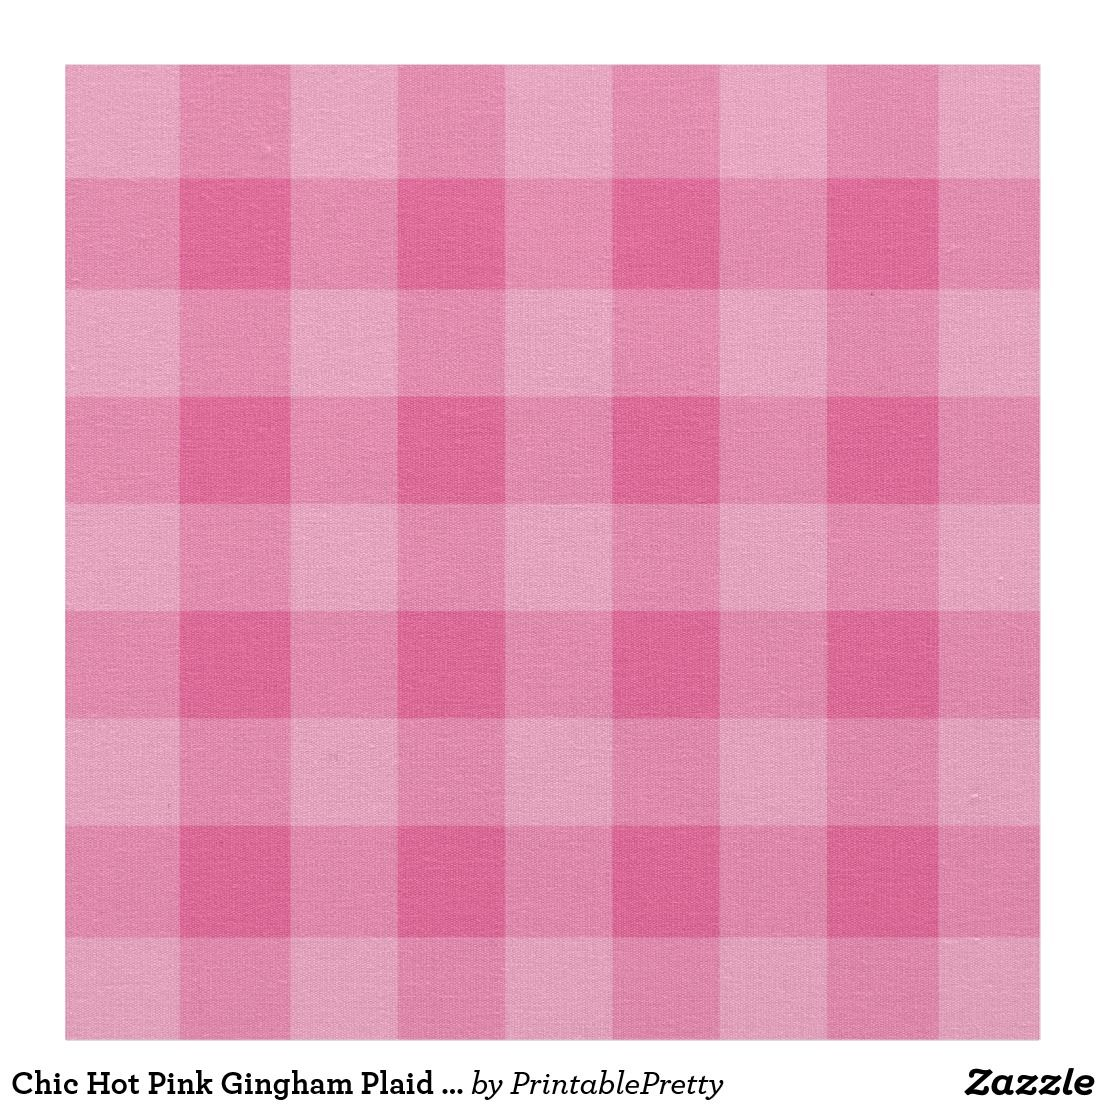 Chic Hot Pink Gingham Plaid Pattern Fabric Fabric